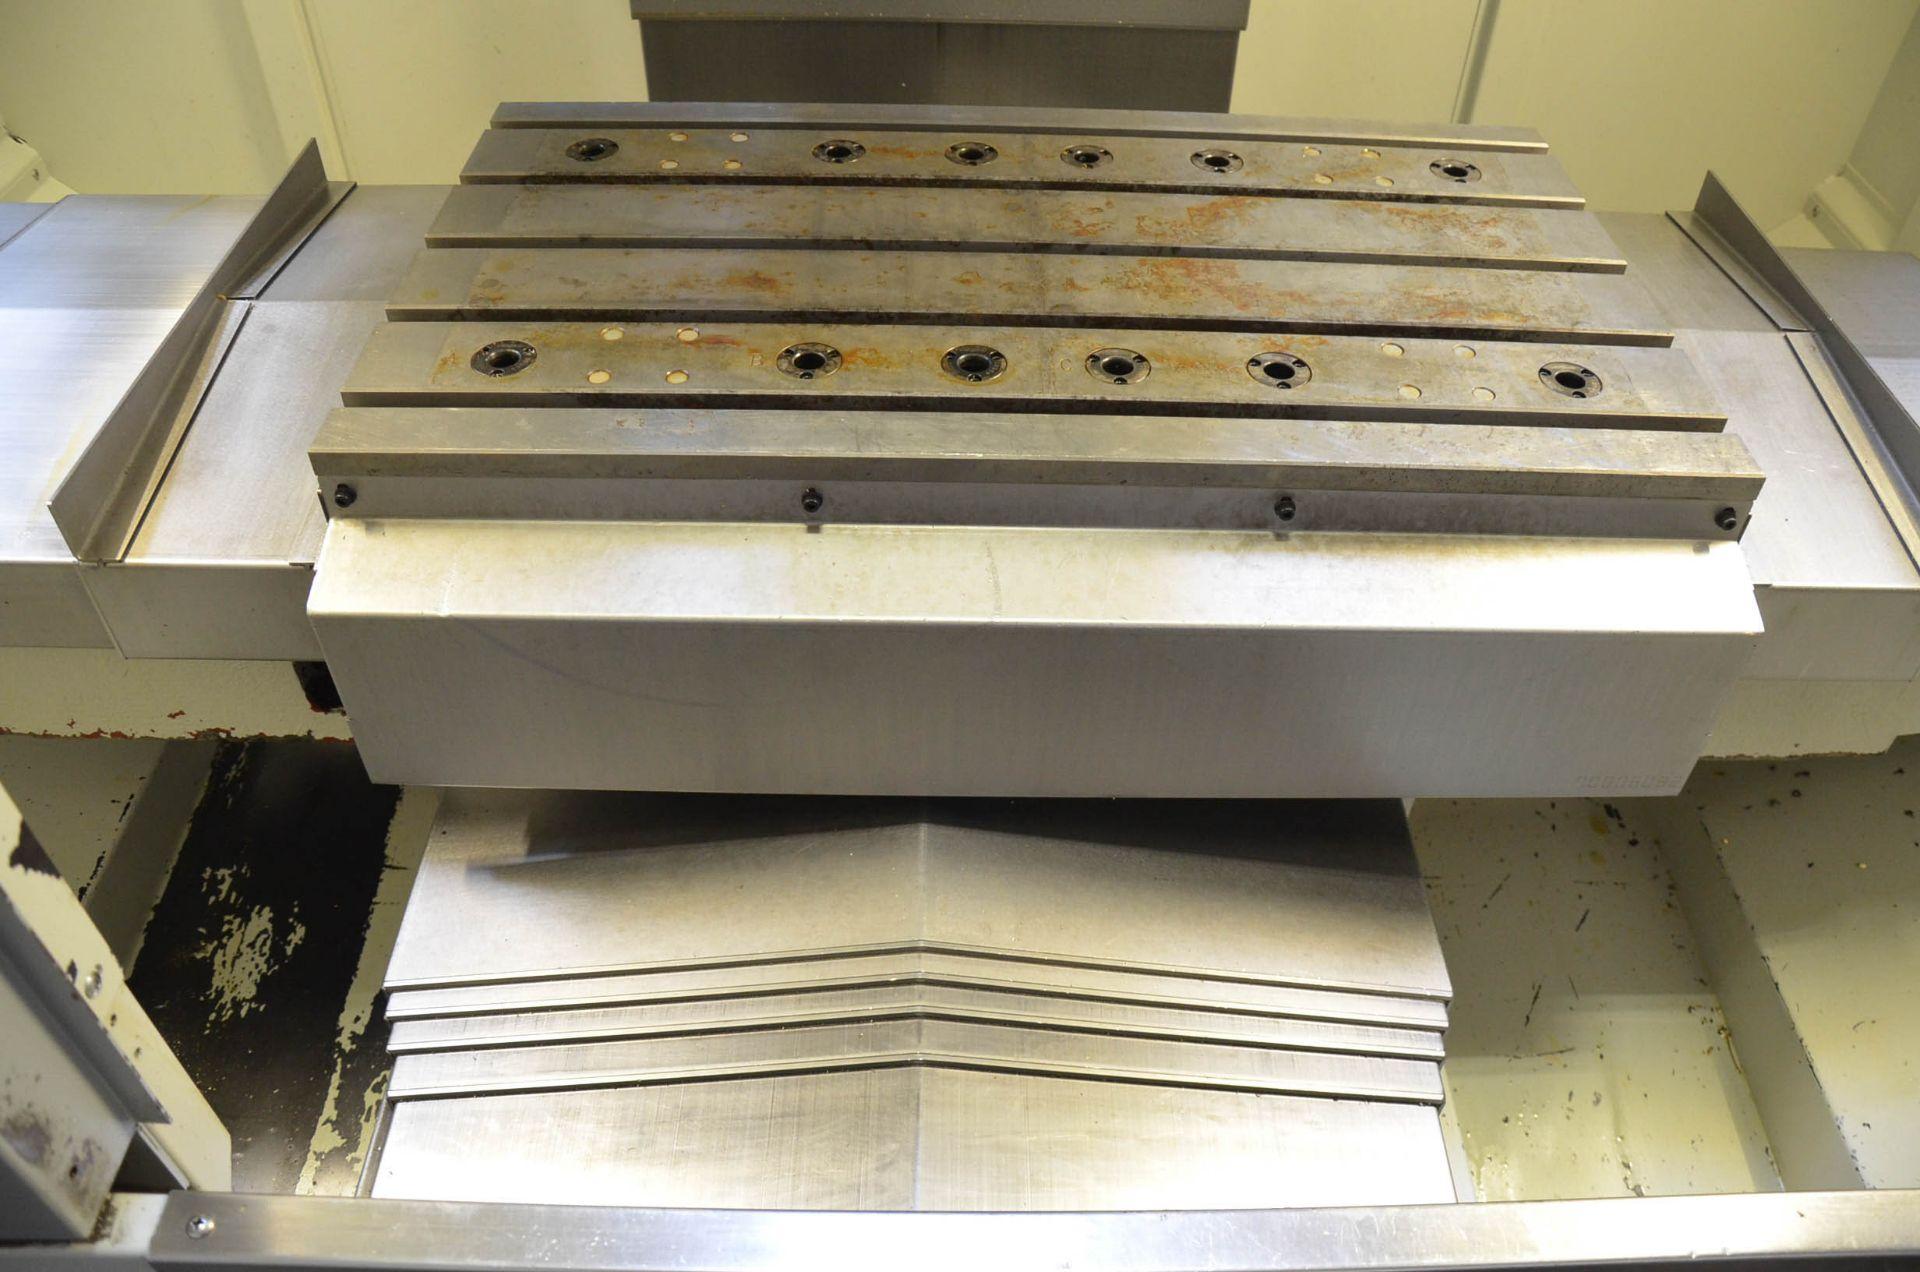 SWI (2014) TRAK LPM 4-AXIS READY CNC VERTICAL MACHINING CENTER WITH PROTO TRAK PMX CNC CONTROL, 19. - Image 11 of 12